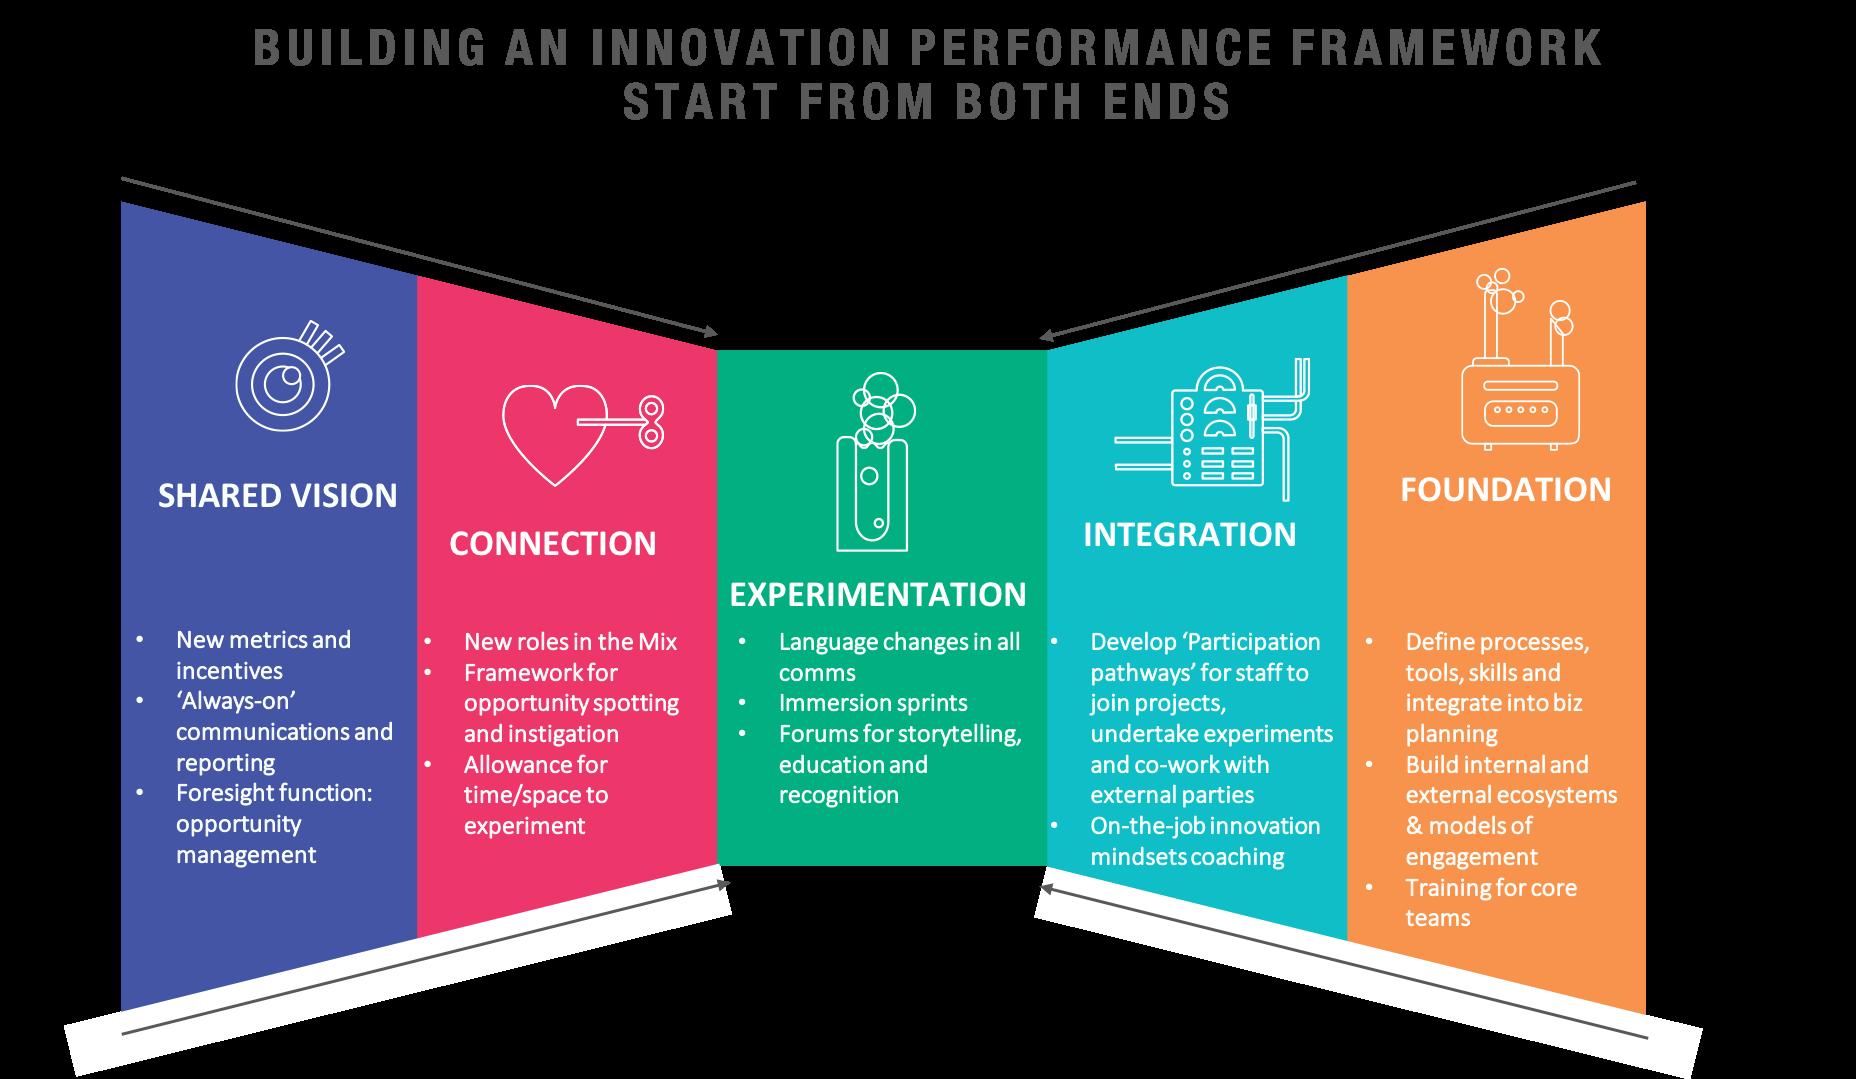 Innovation performance framework.png